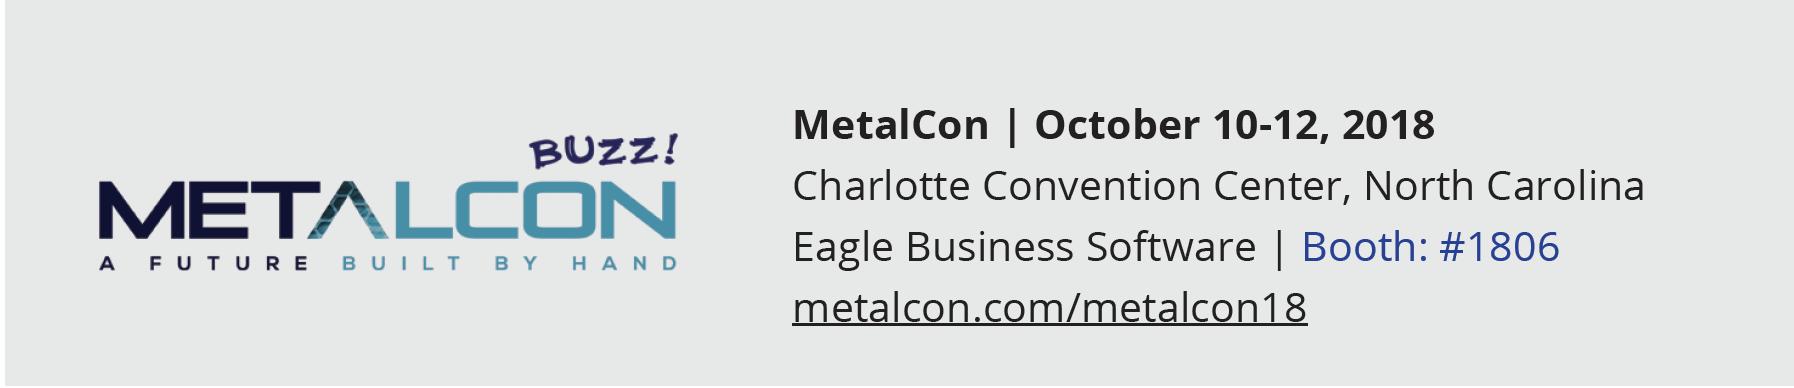 MetalCon-Show-Info